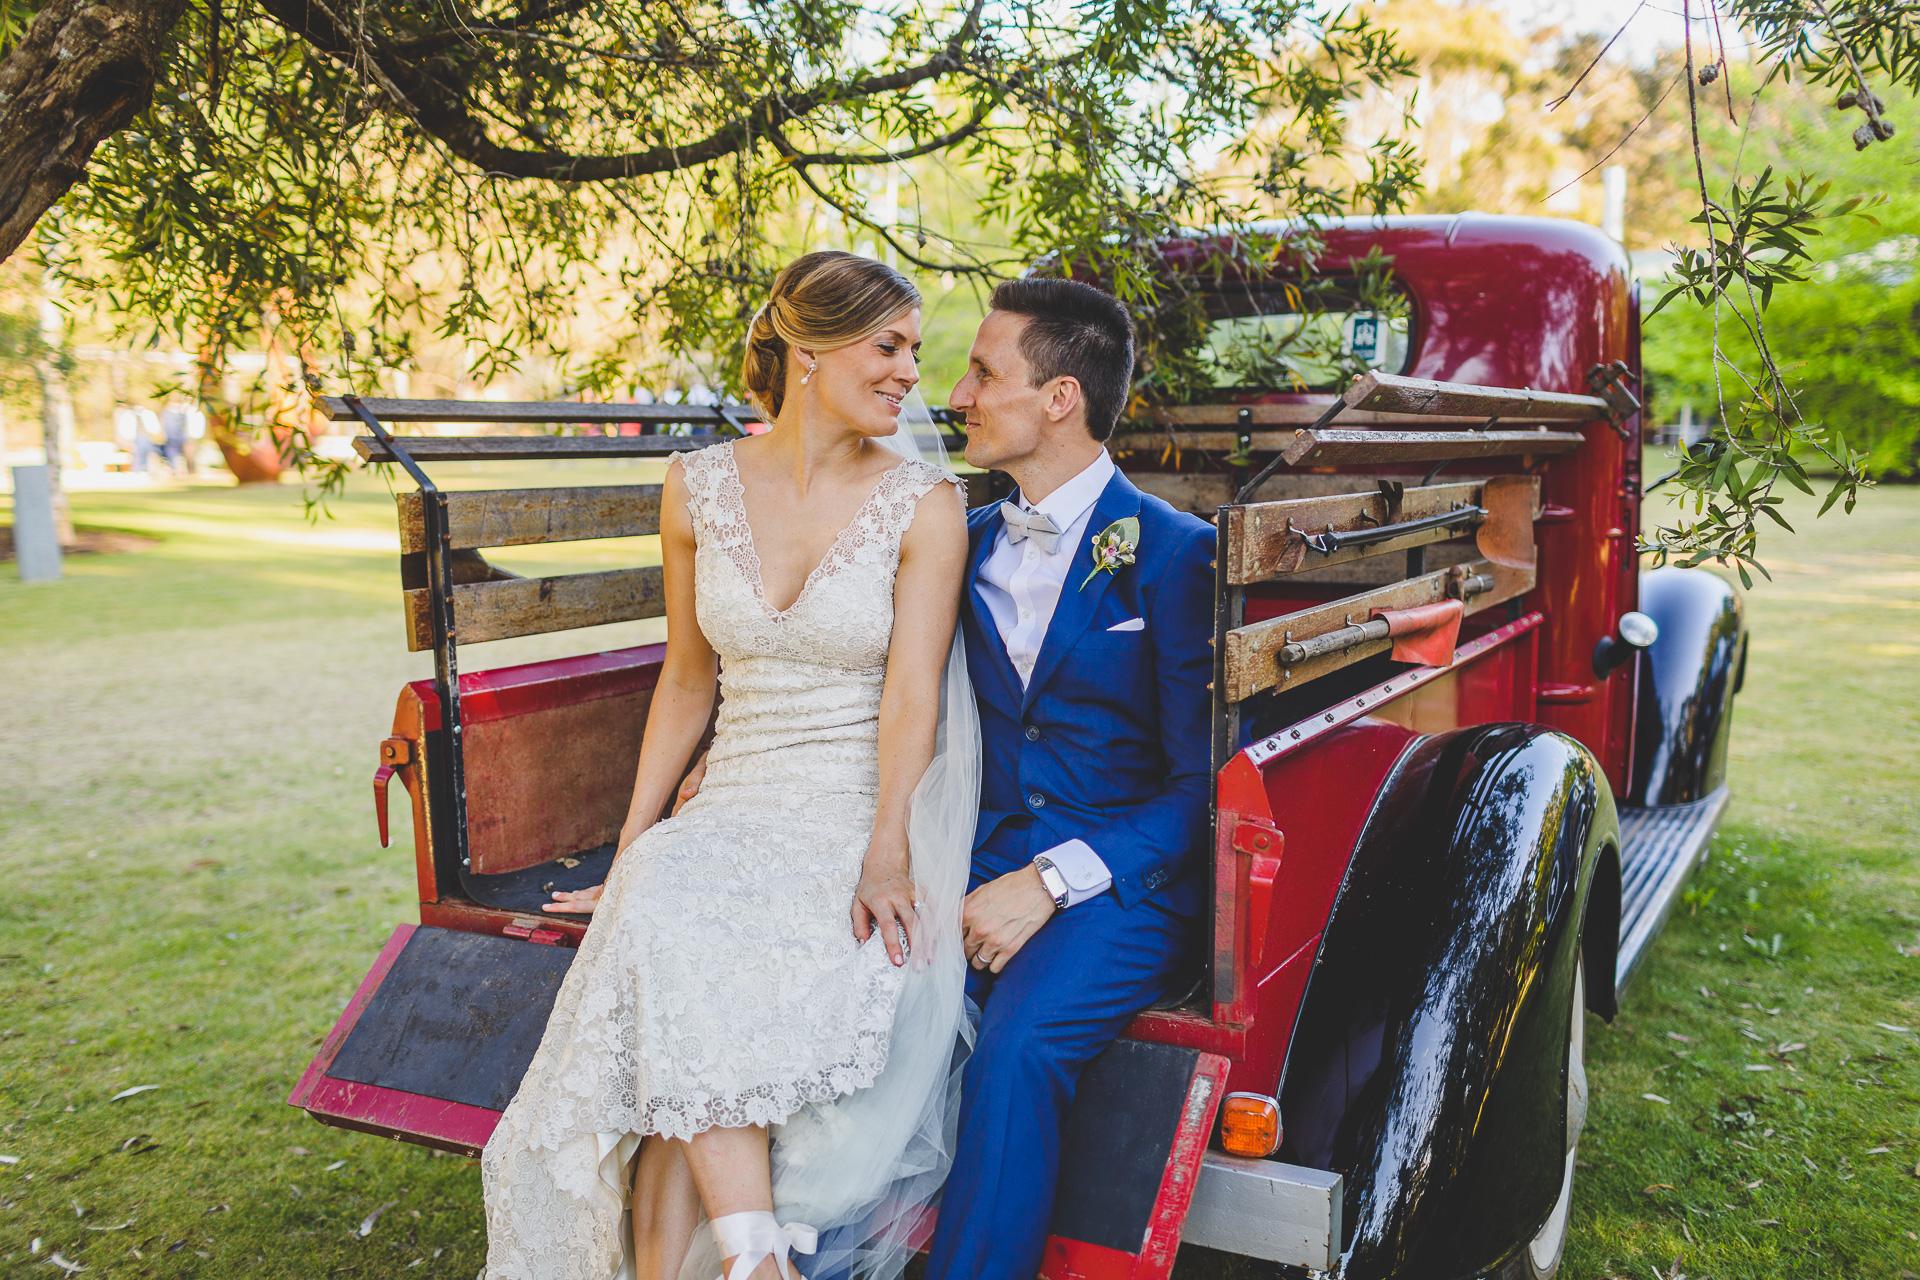 20161112 - Heath_Ruth_Wombat_Hollow_Wedding | 397.jpg